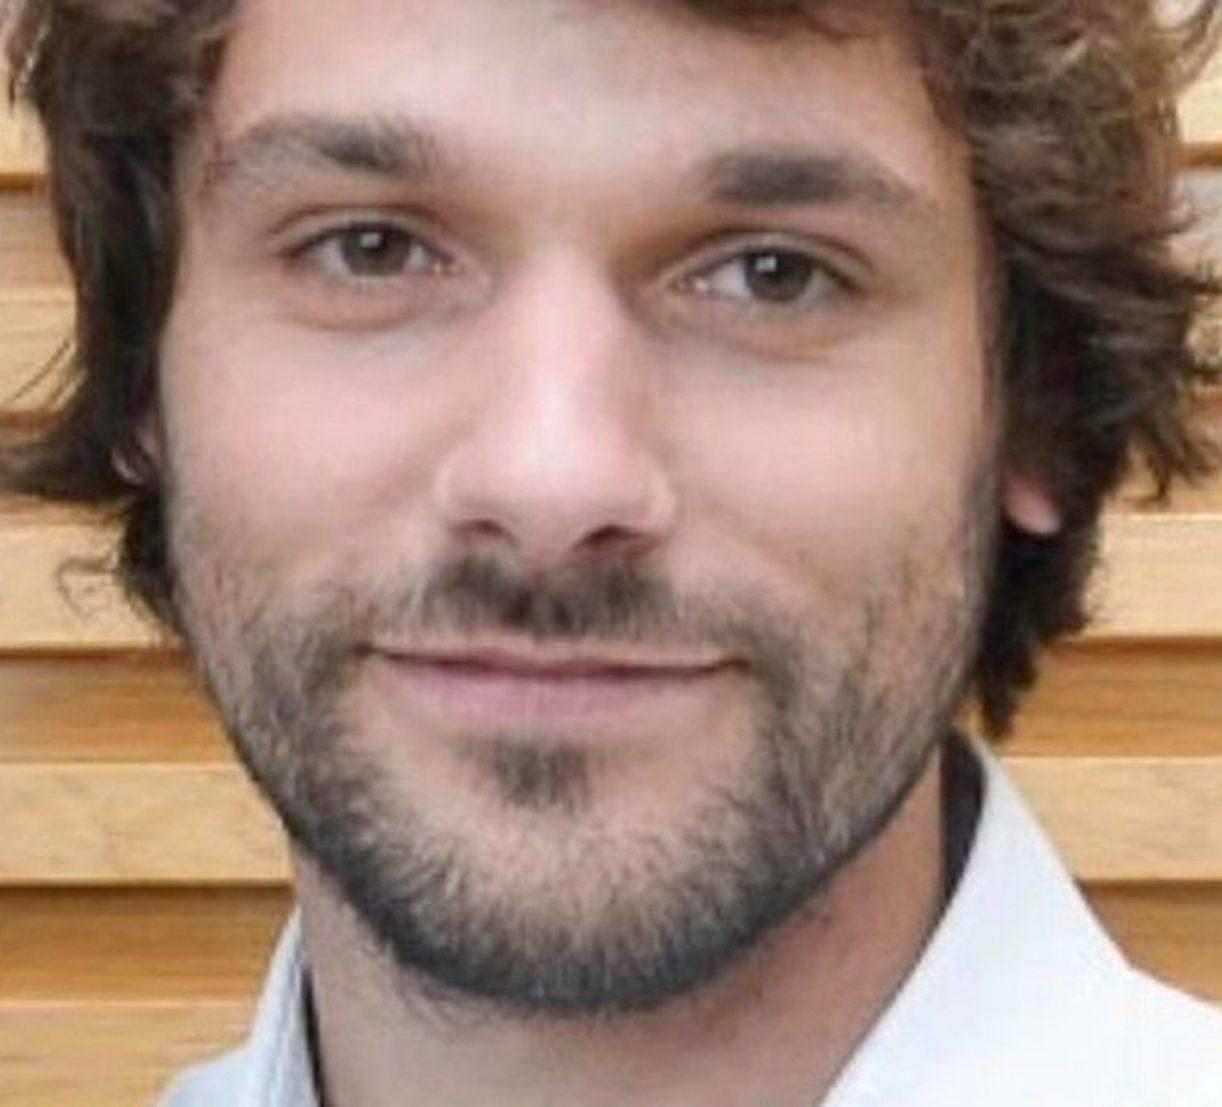 Giacomo Sartori causa morte